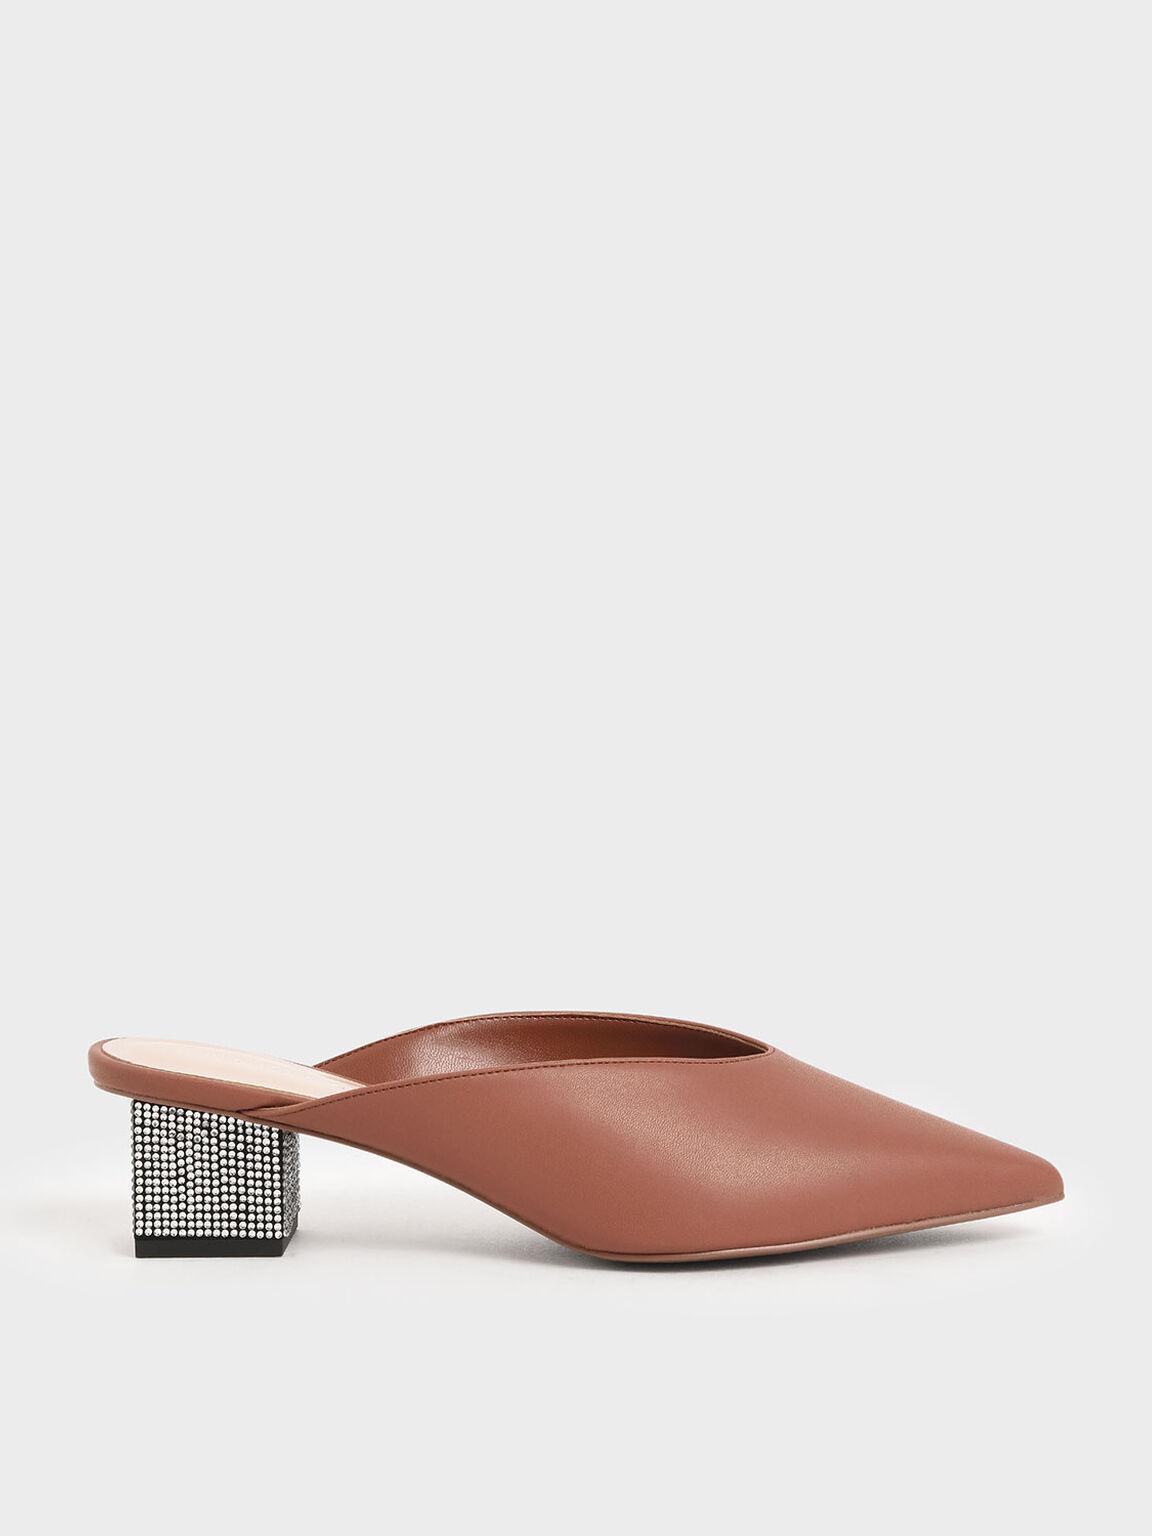 Embellished Block Heel Mules, Brick, hi-res